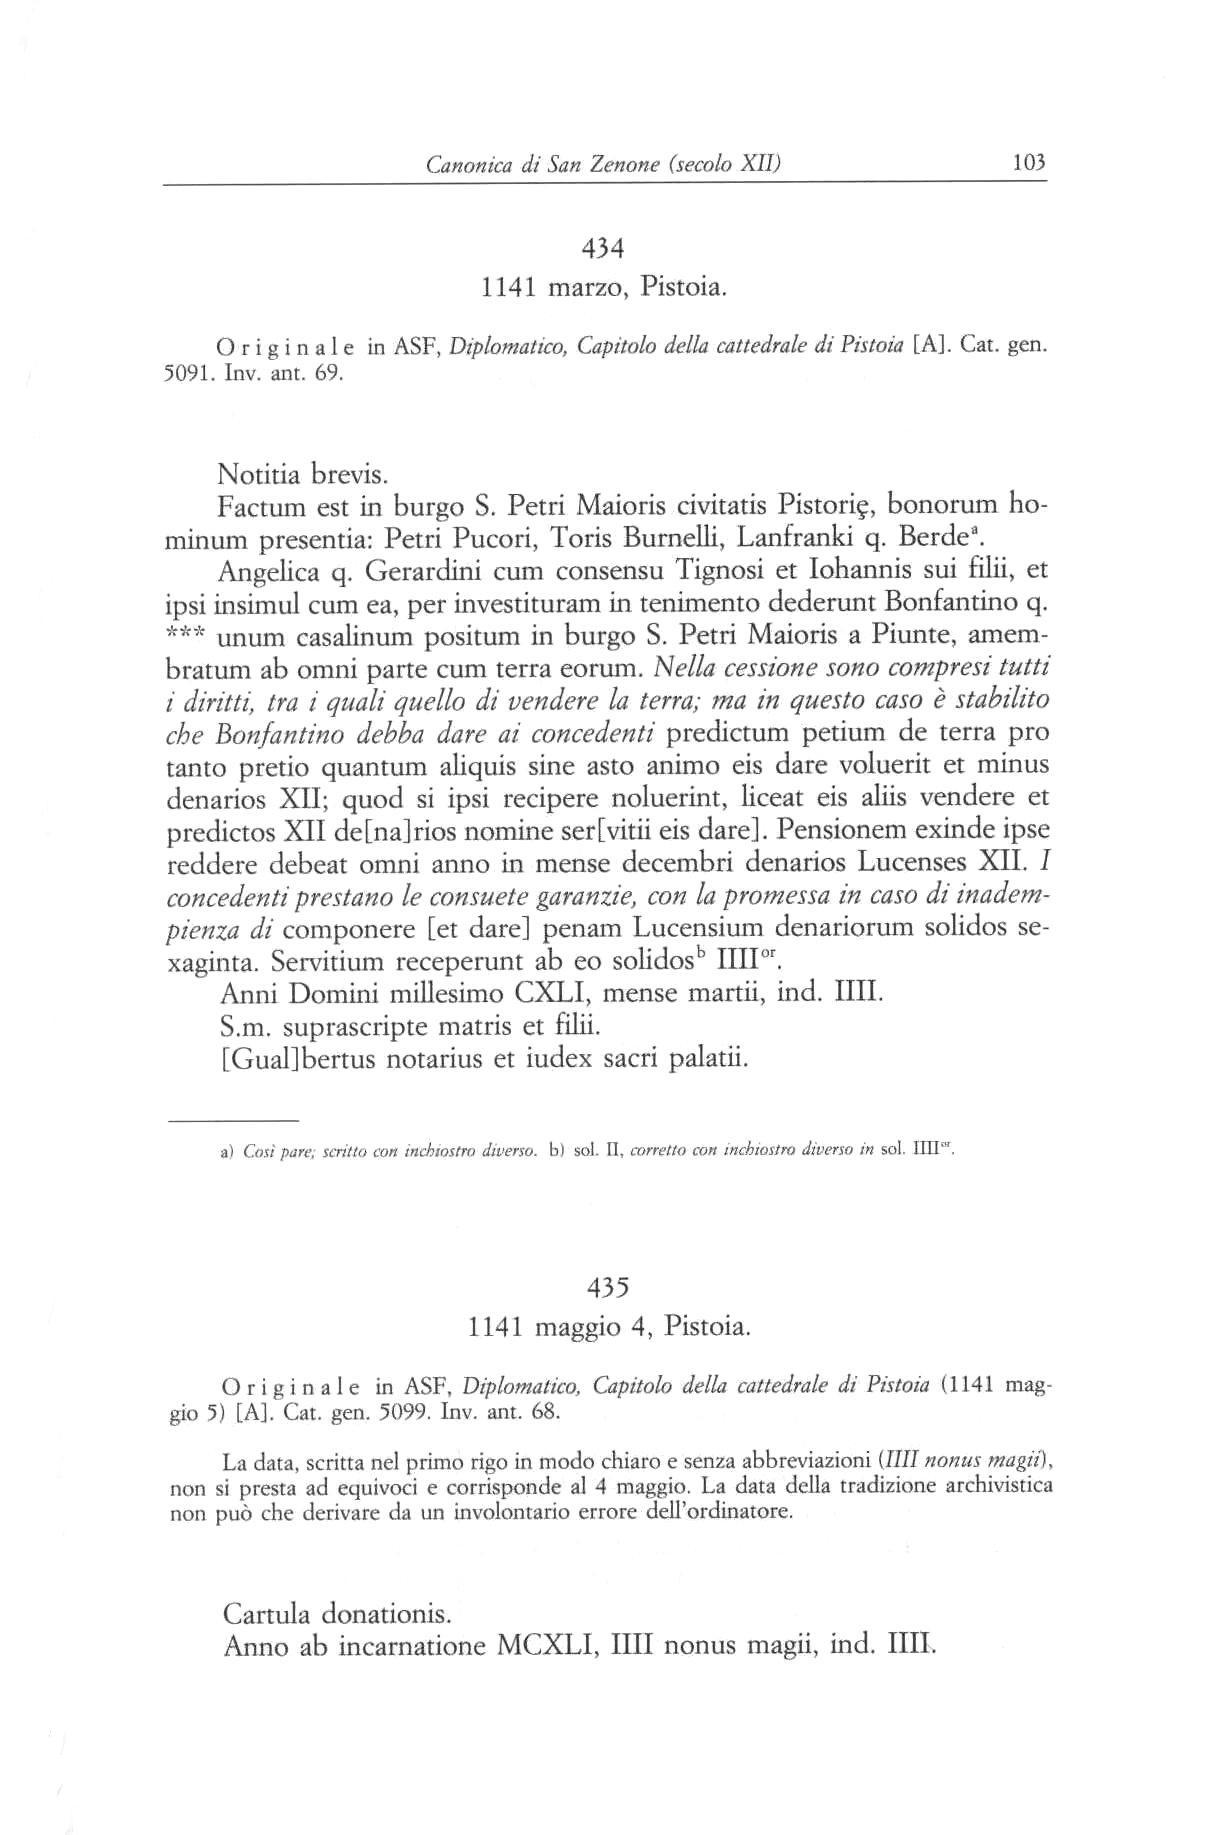 Canonica S. Zenone XII 0103.jpg